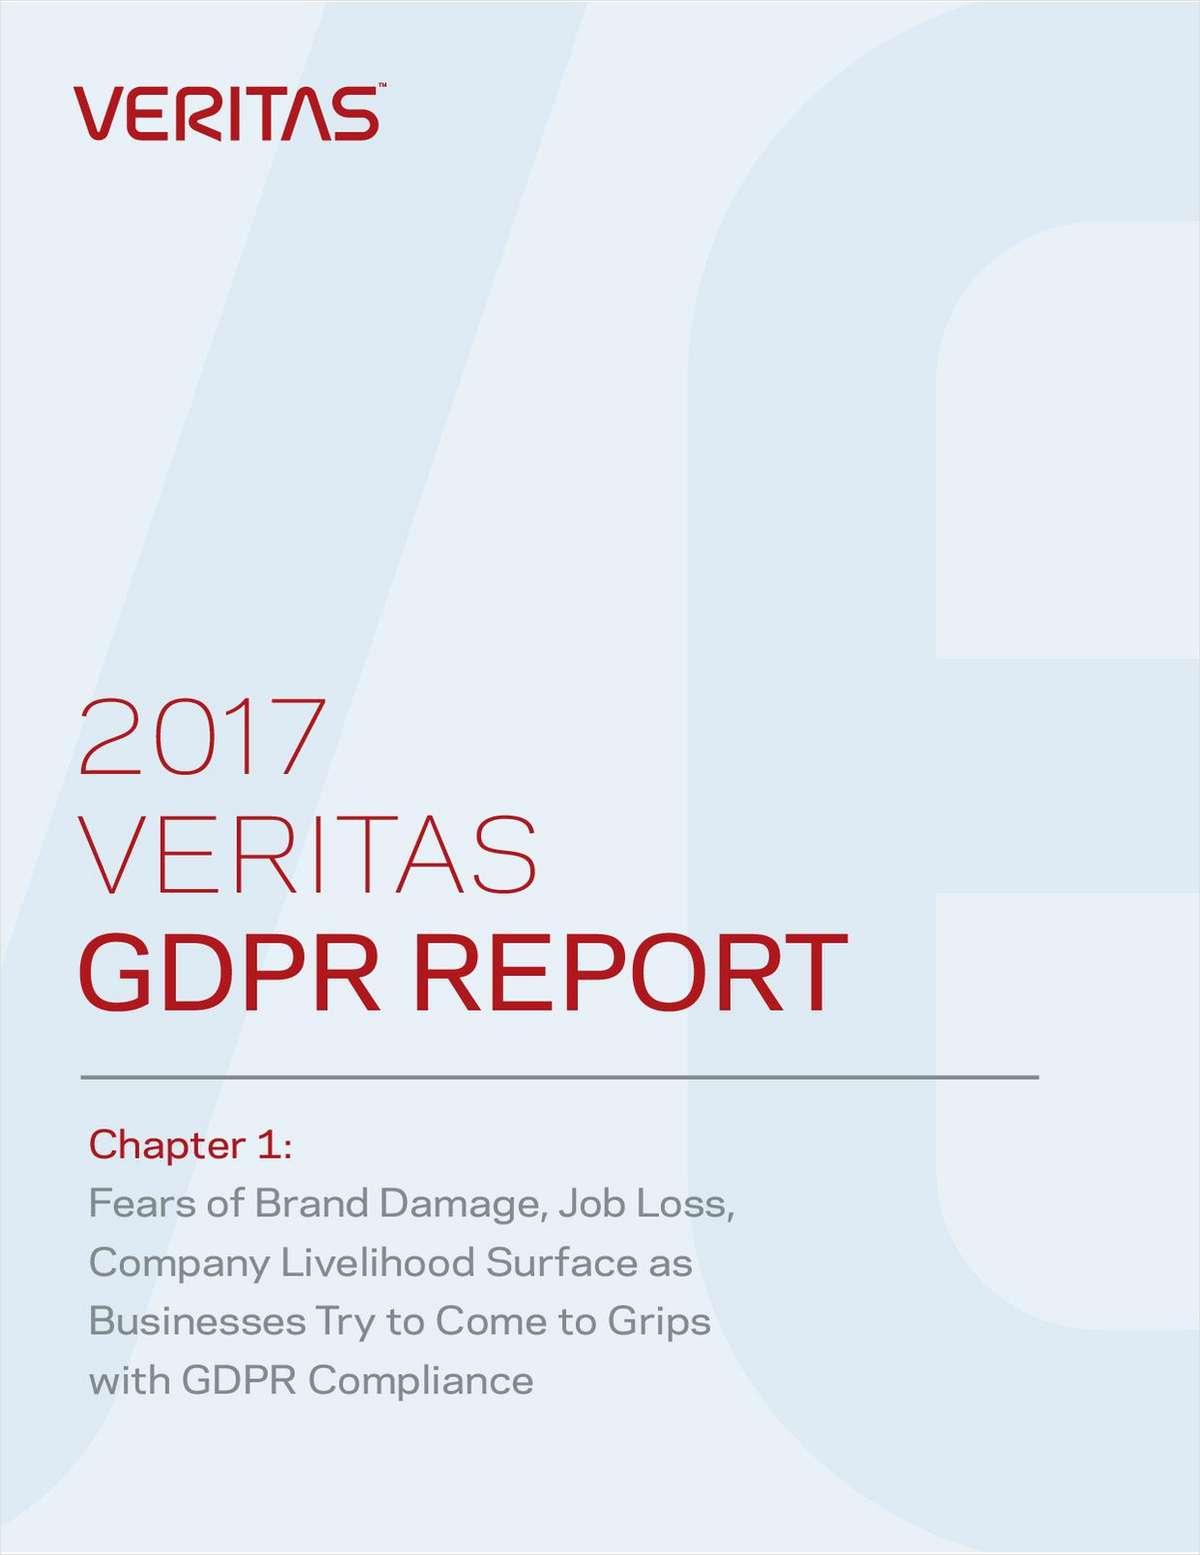 2017 Veritas GDPR Report Chapter 1